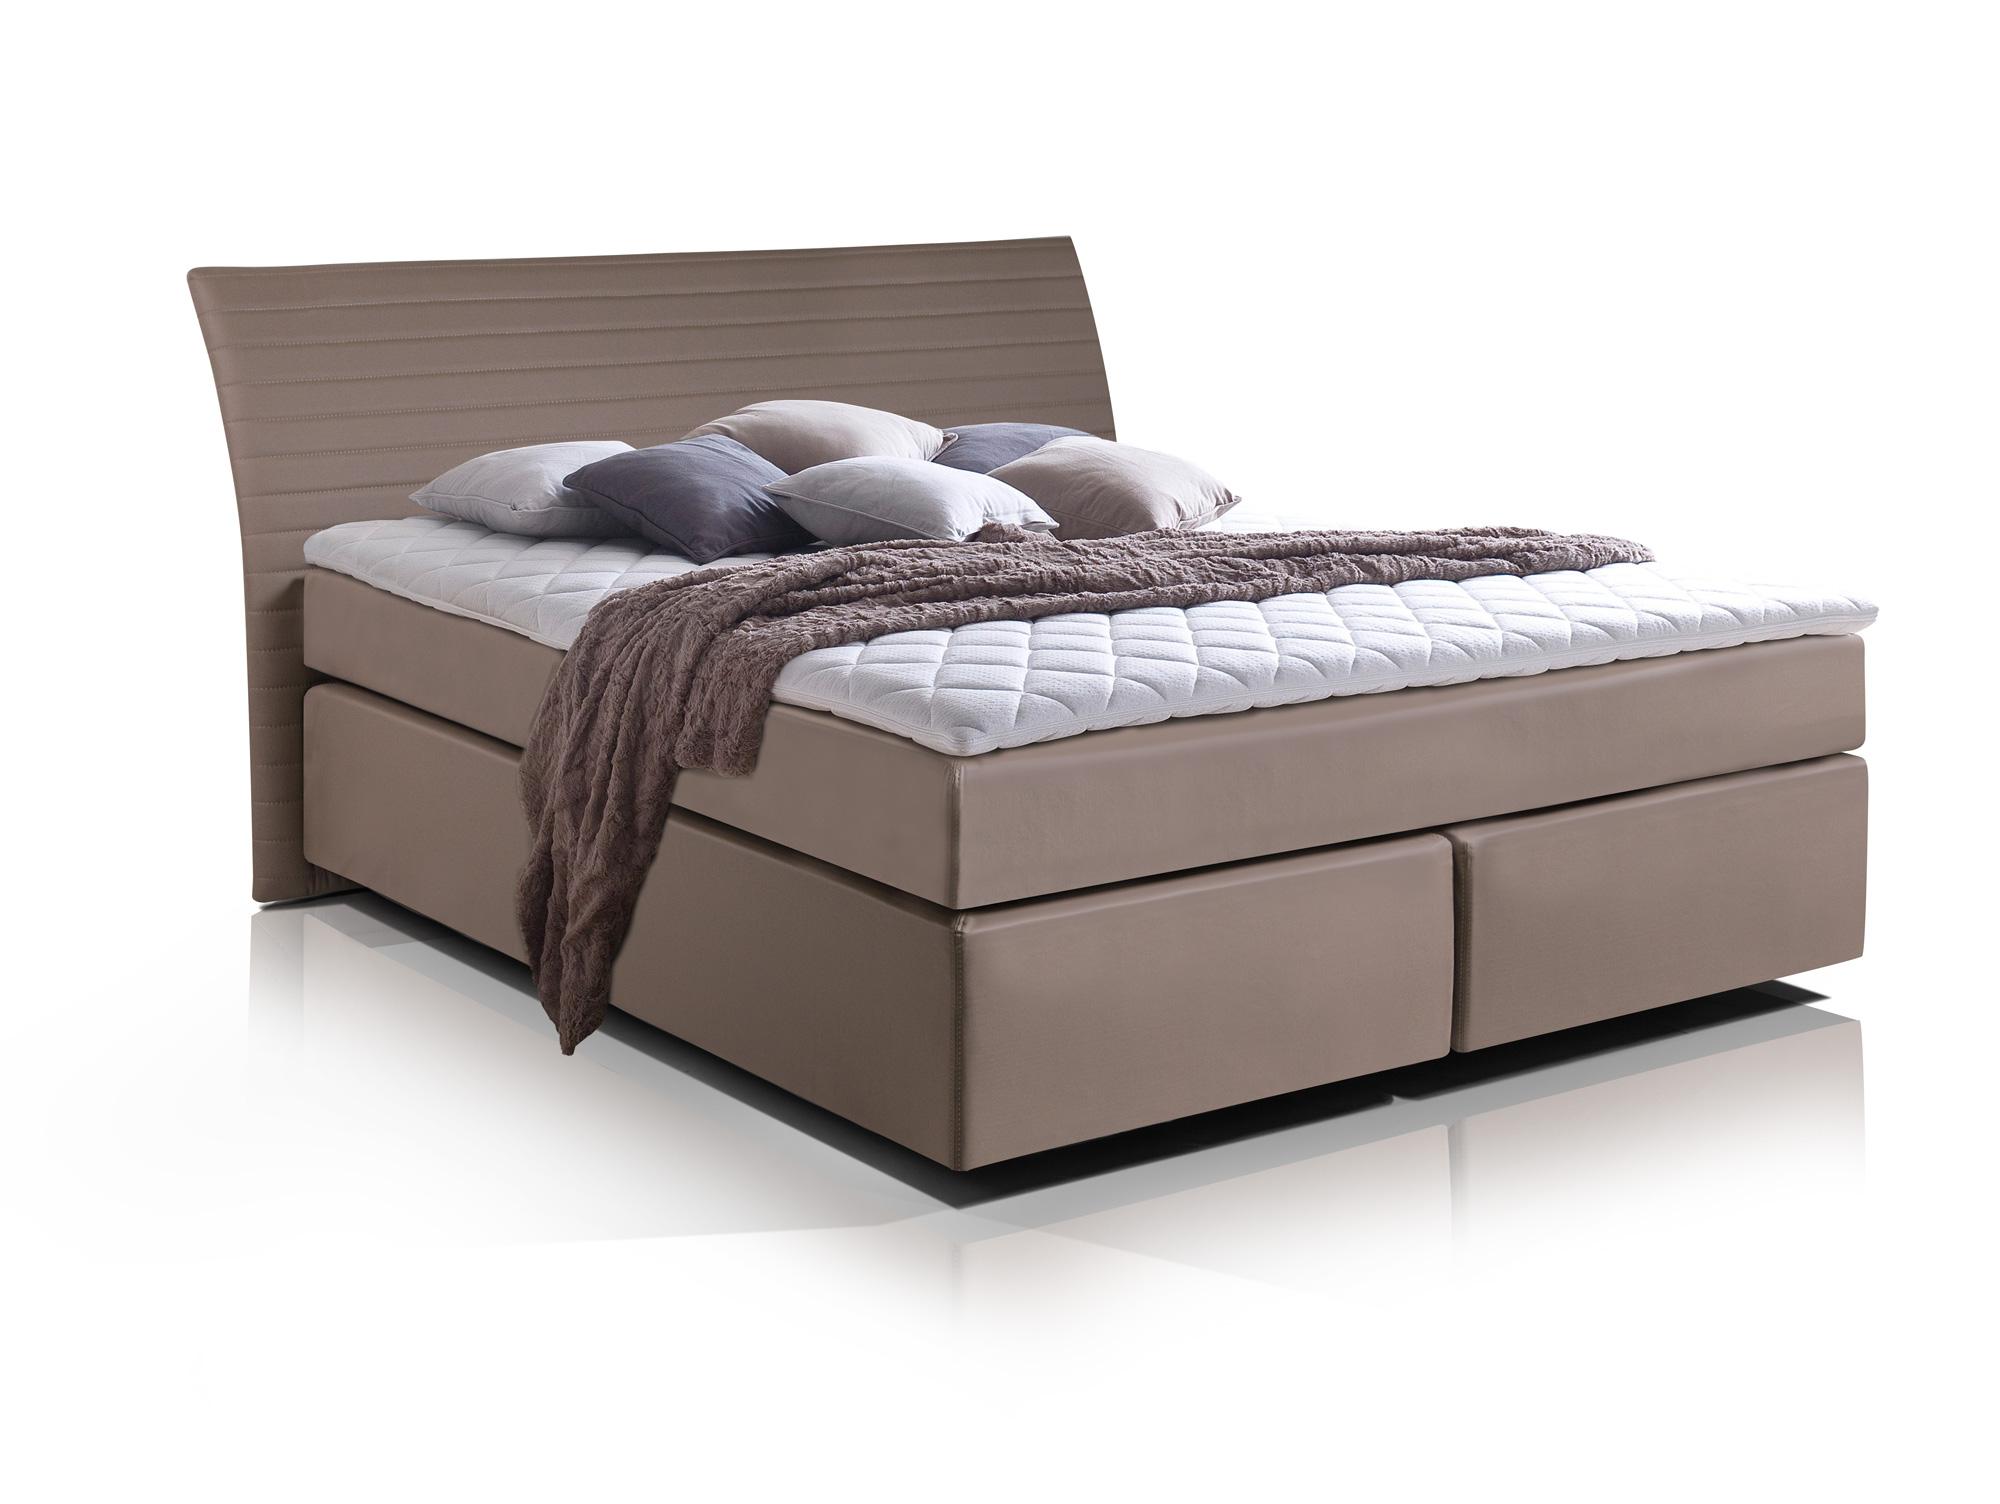 heaven boxspringbett kunstlederbezug 160 x 200 cm muddy h rtegrad 2 3. Black Bedroom Furniture Sets. Home Design Ideas